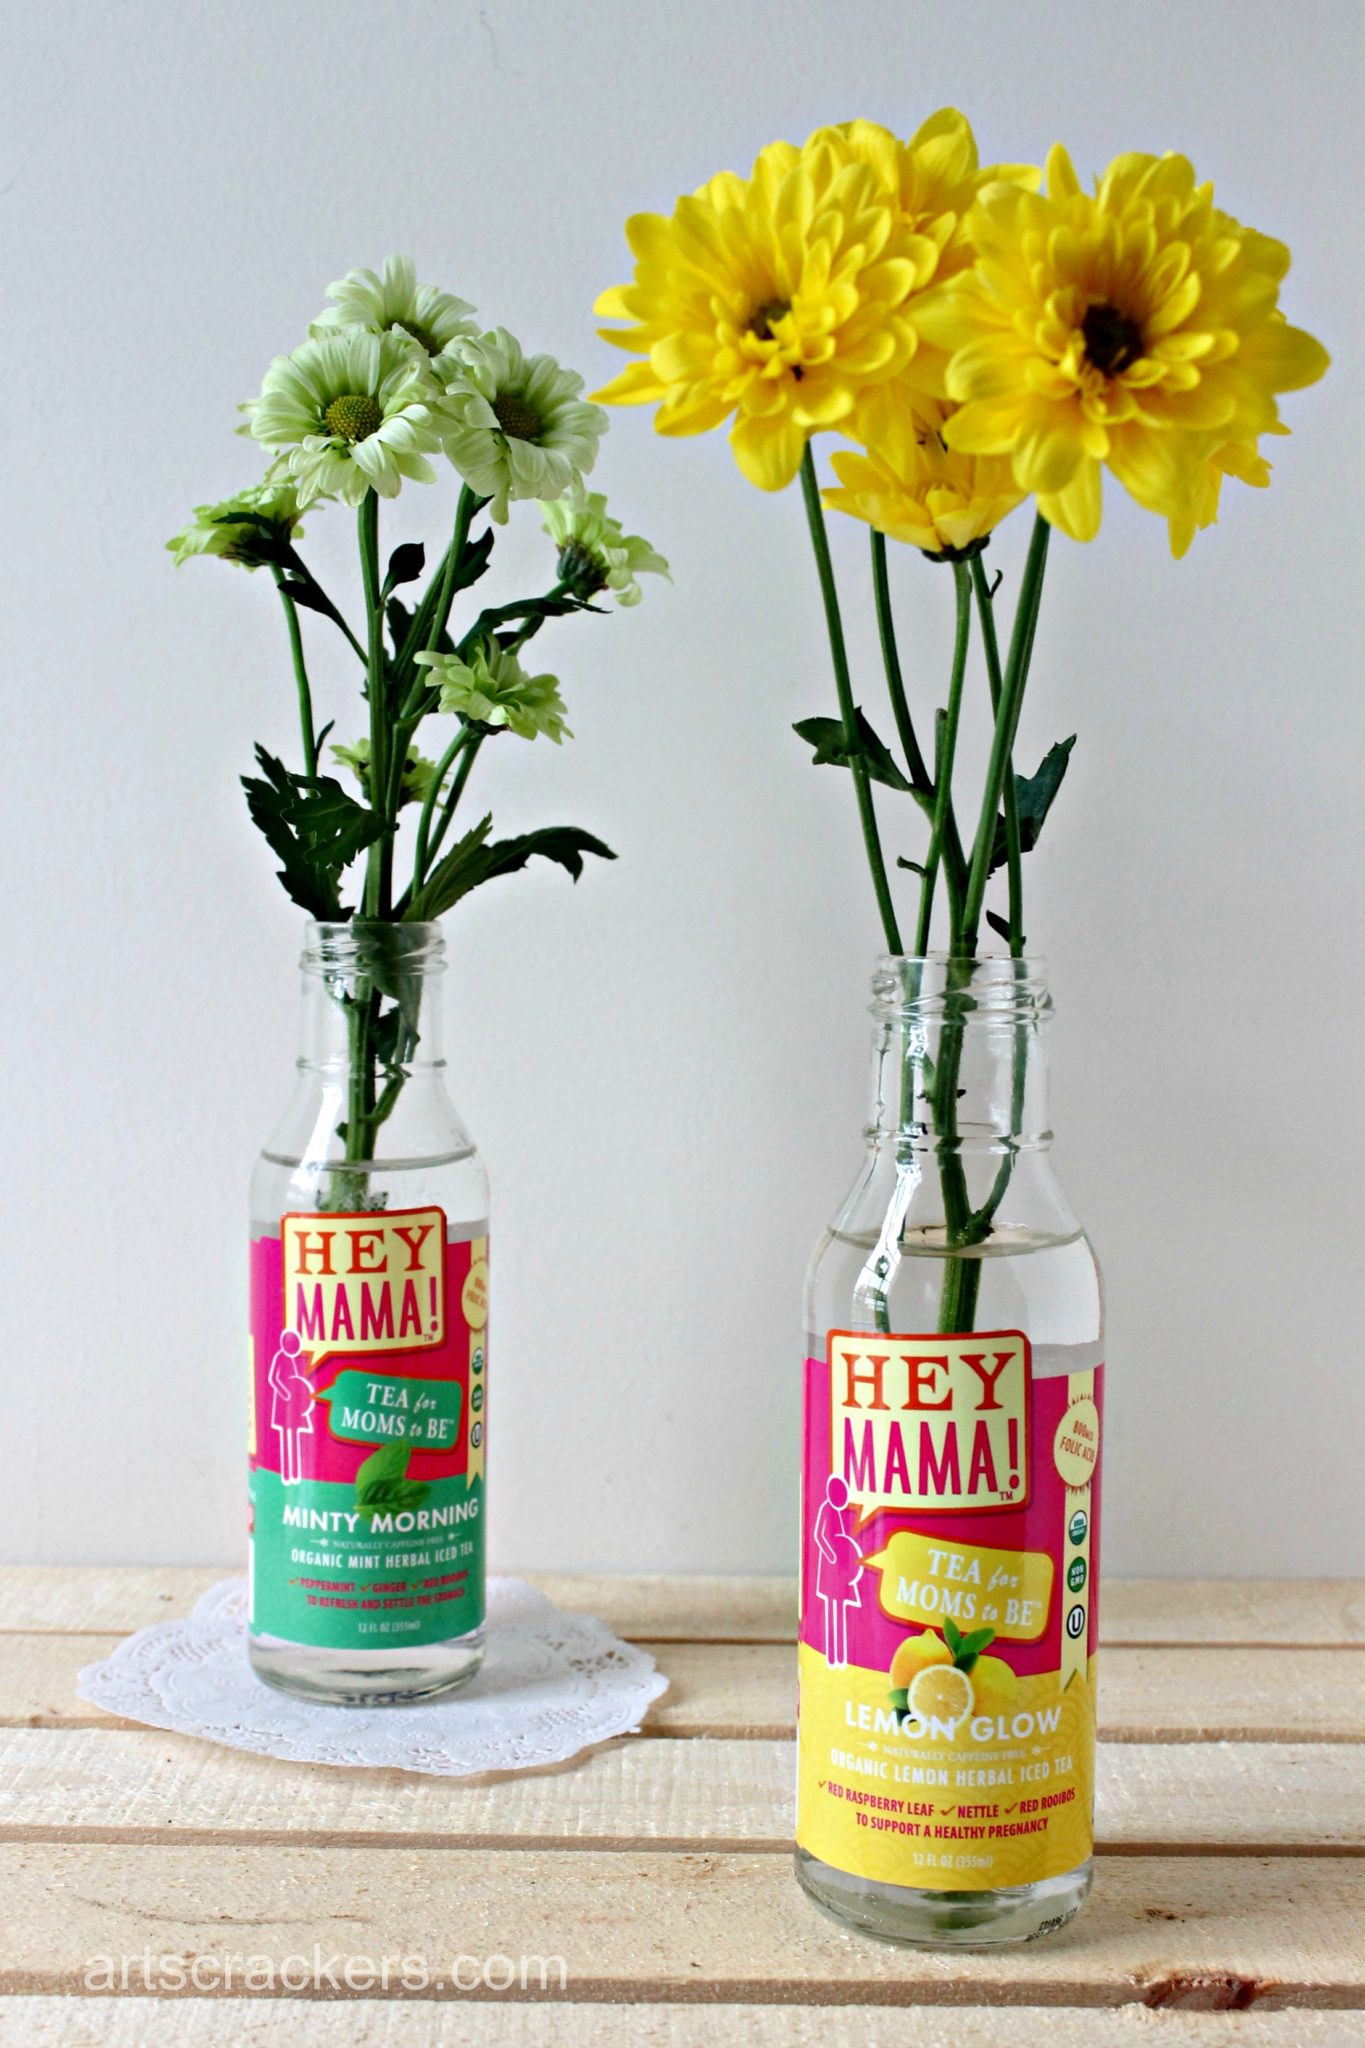 Hey Mama Teas Bottle Flower Vase